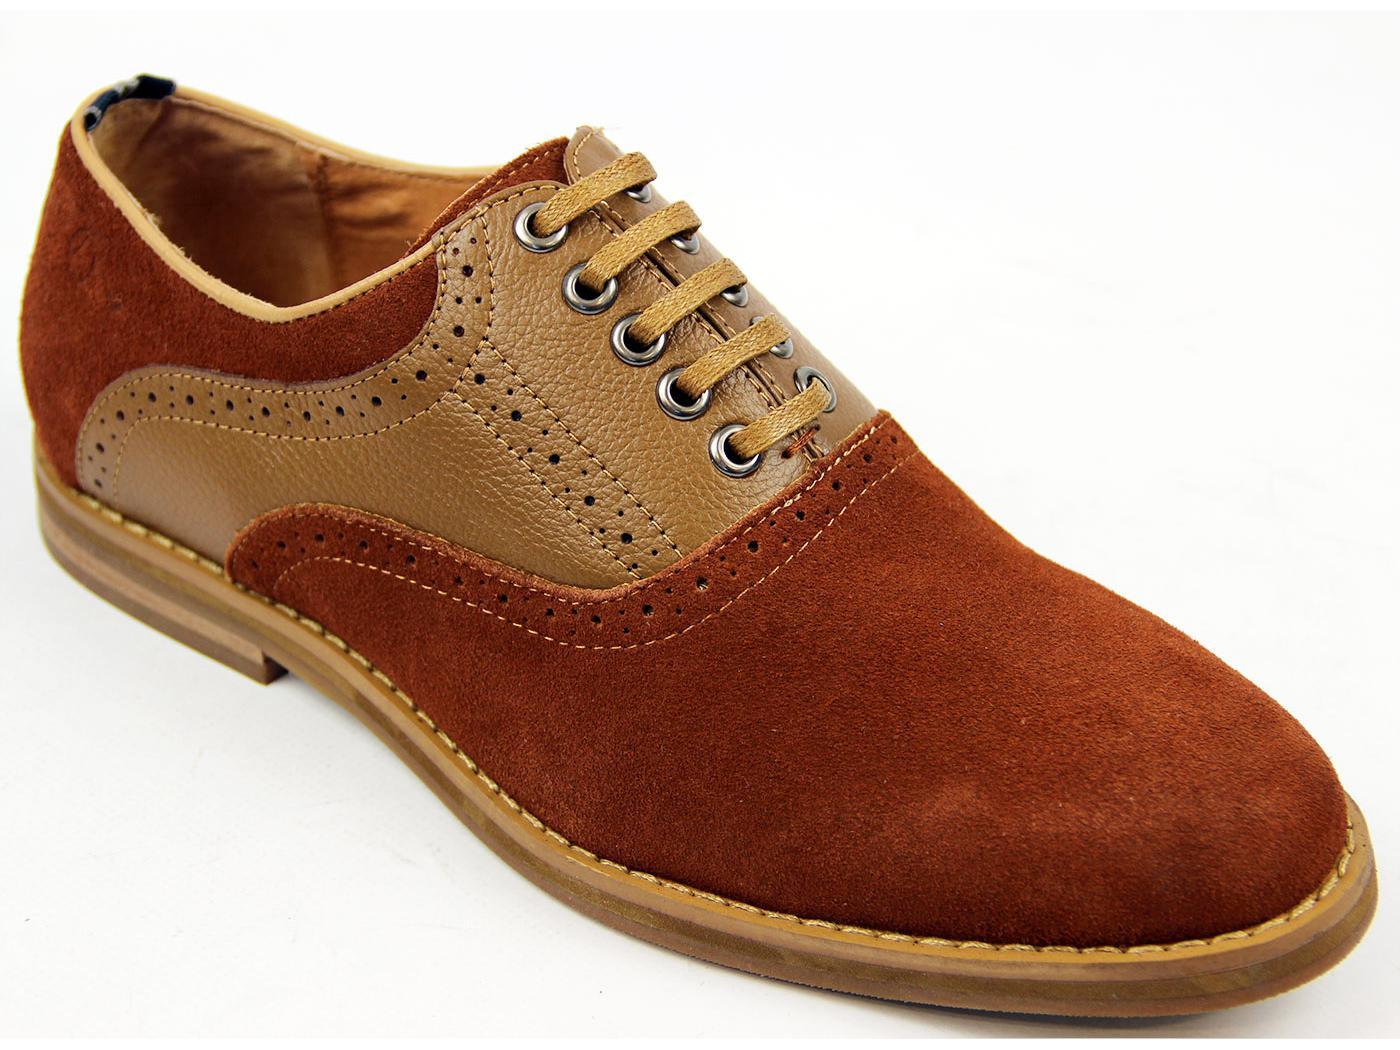 PETER WERTH Nesbitt Retro 60s Mod Saddle Oxford Shoes In Brown